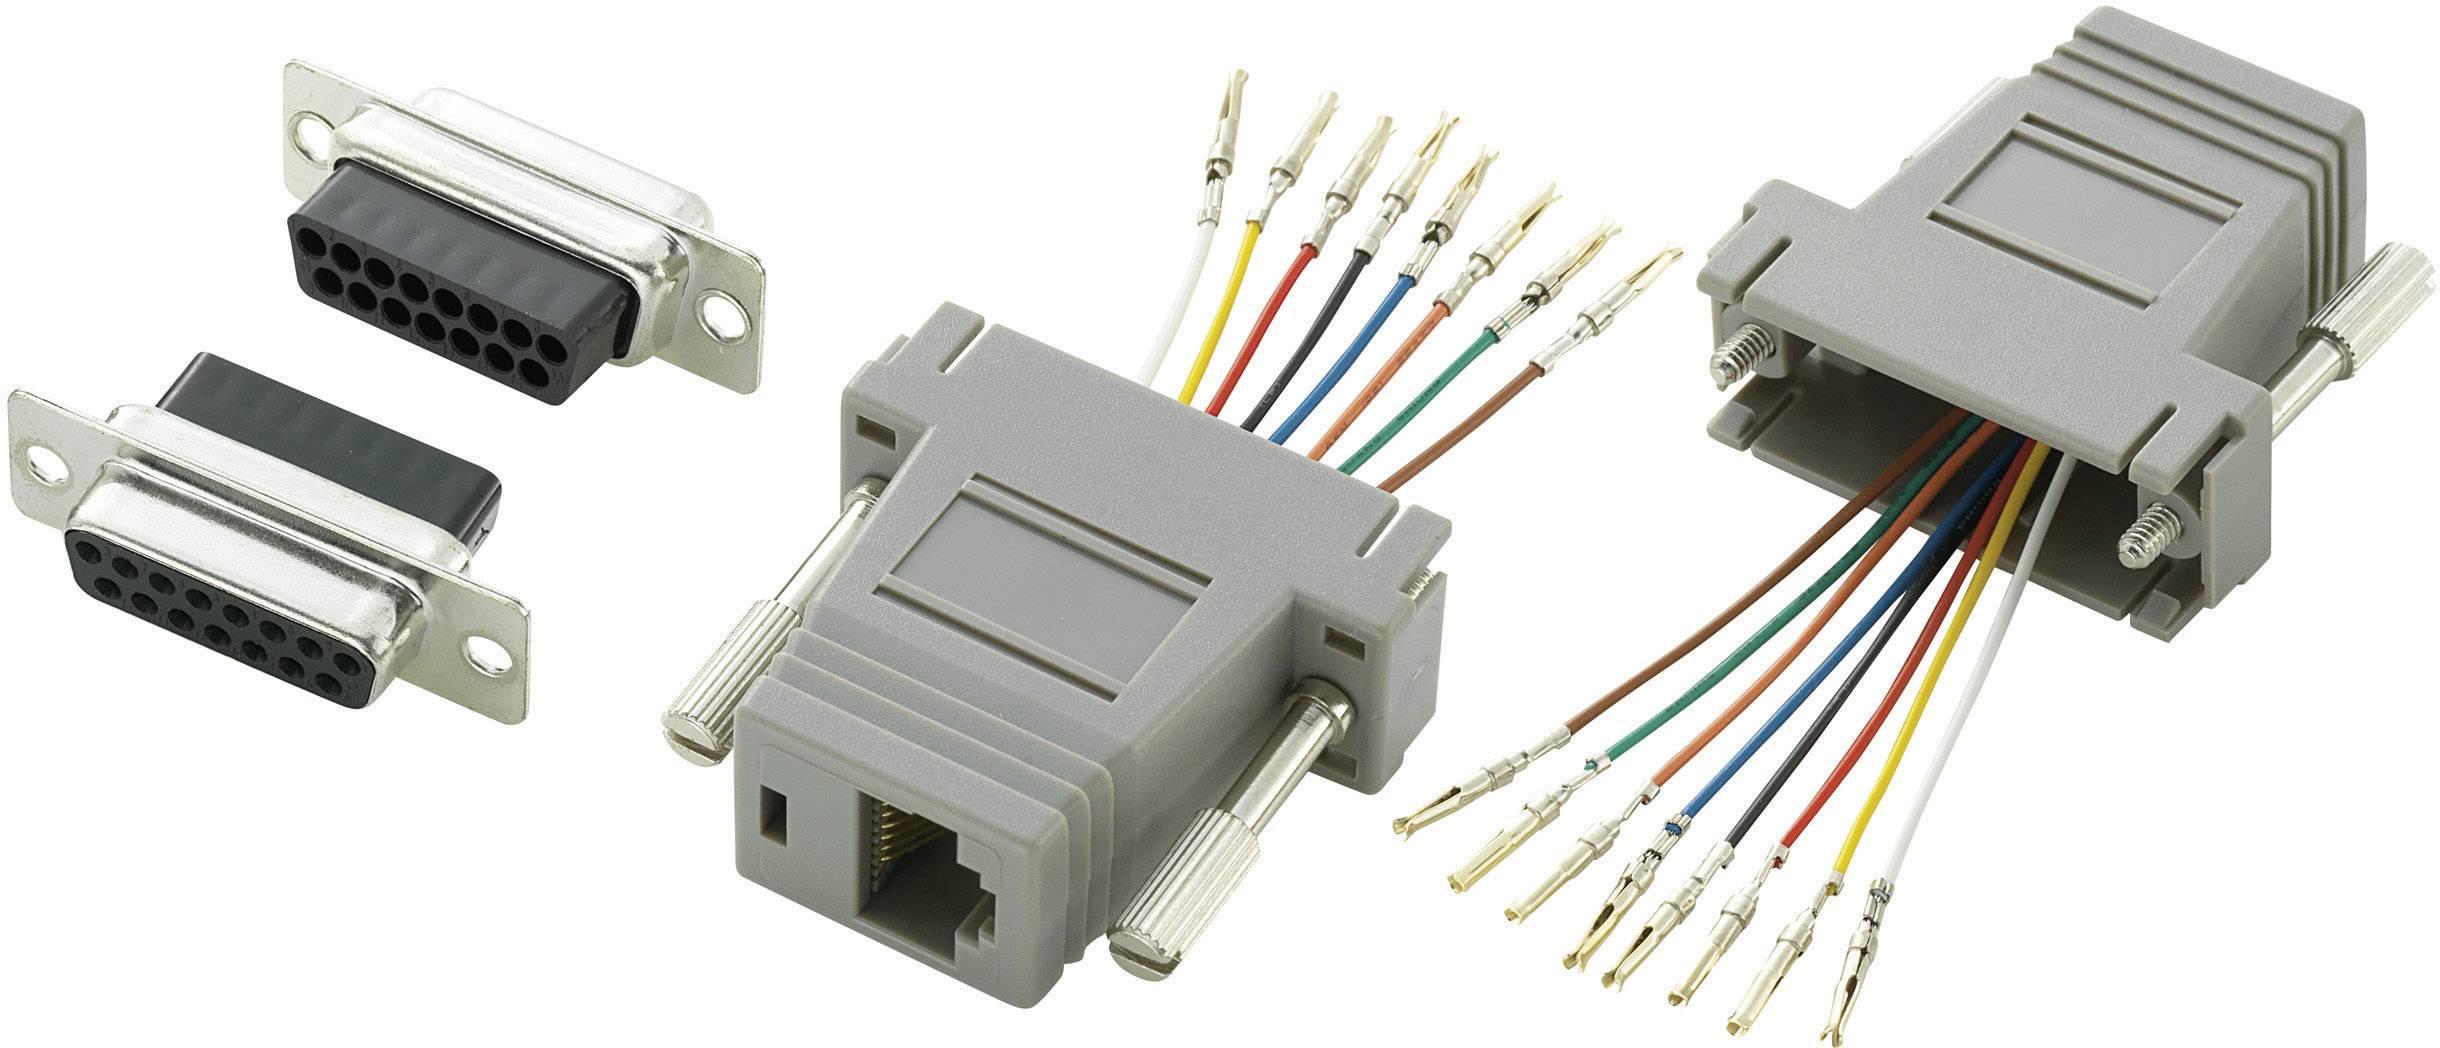 D-SUB adaptér TRU COMPONENTS 407778 D-SUB zásuvka 15pólová - RJ45 zásuvka, 1 ks